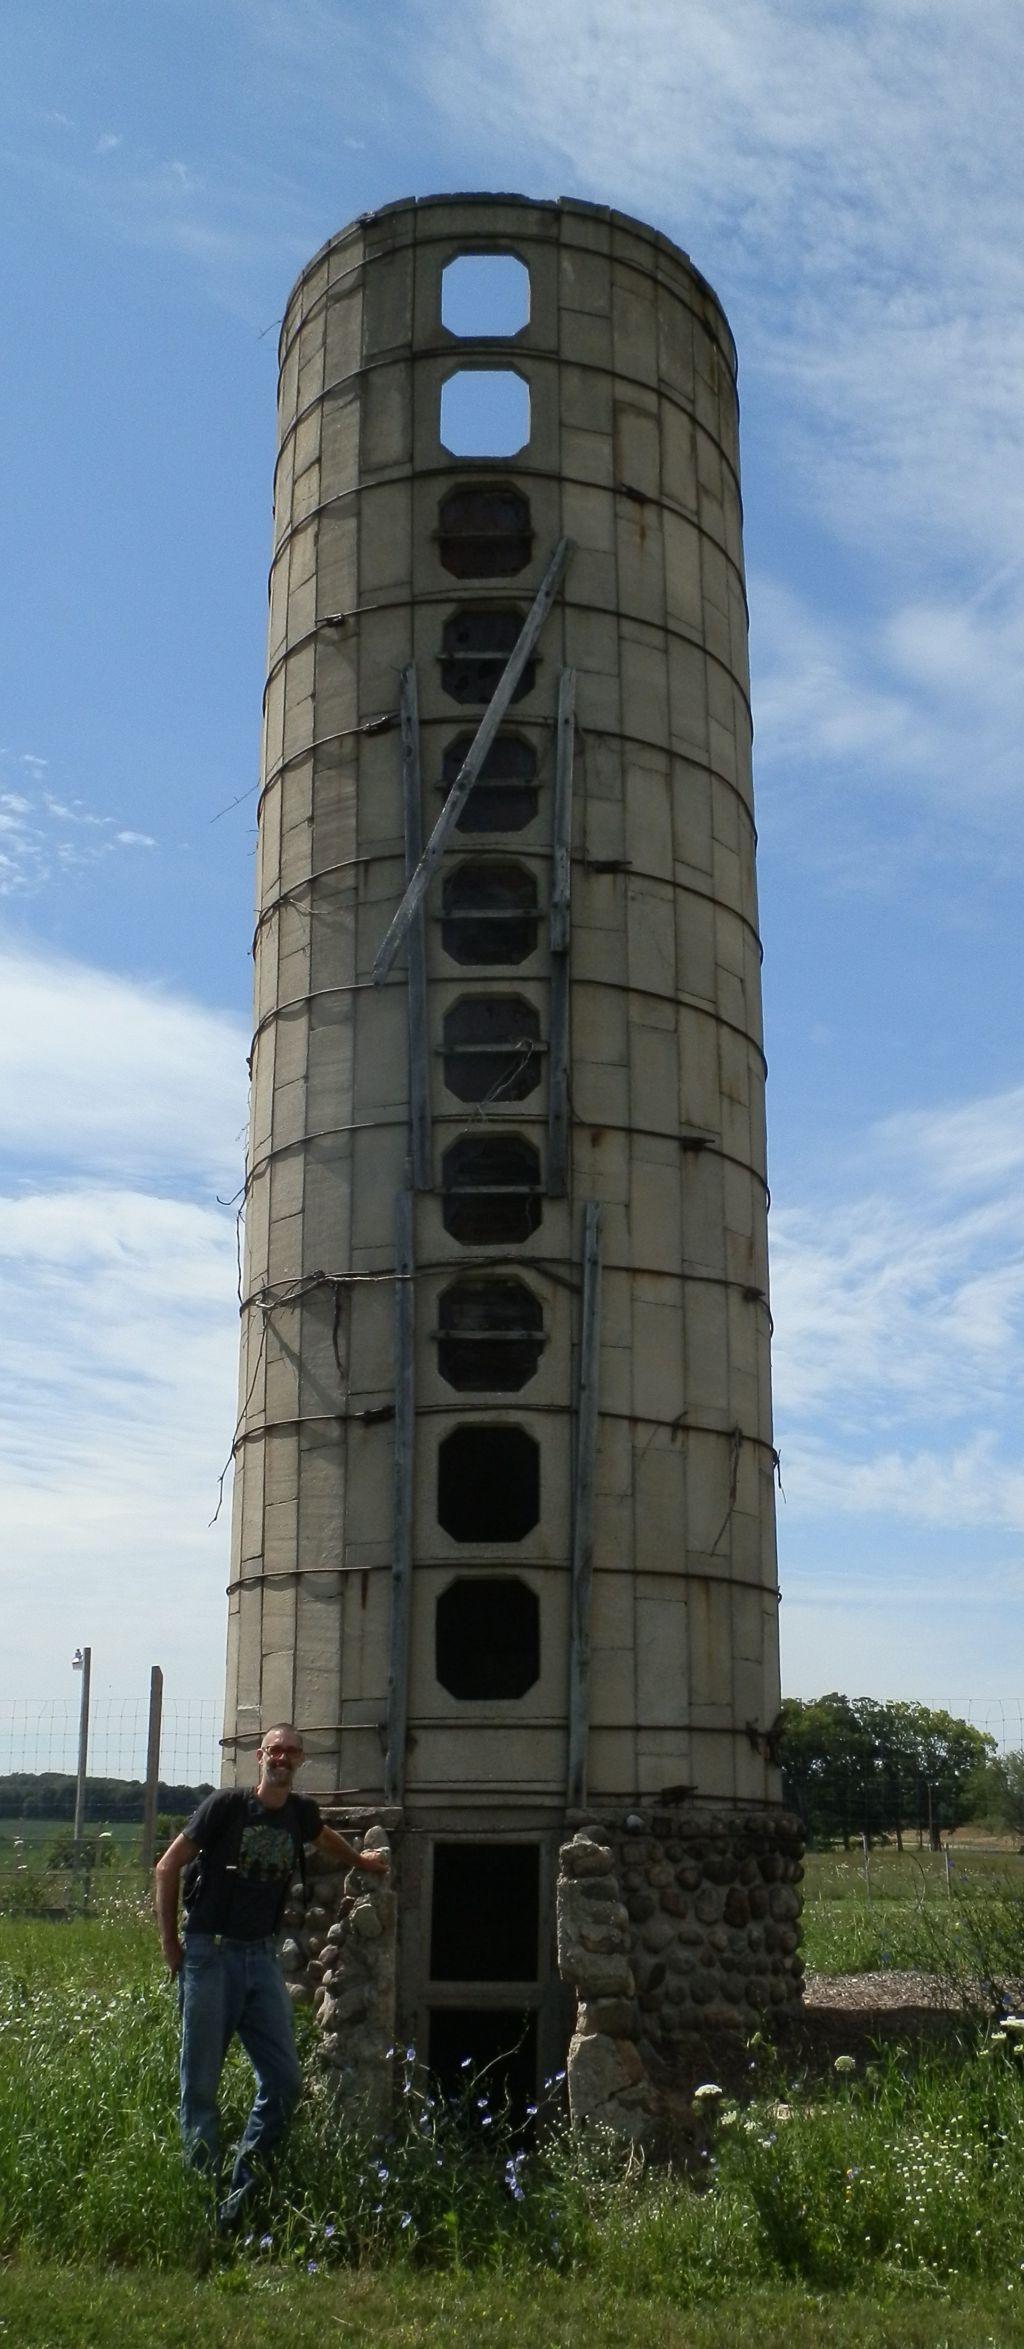 Matt checking out retired silo at Good News Farm & Market